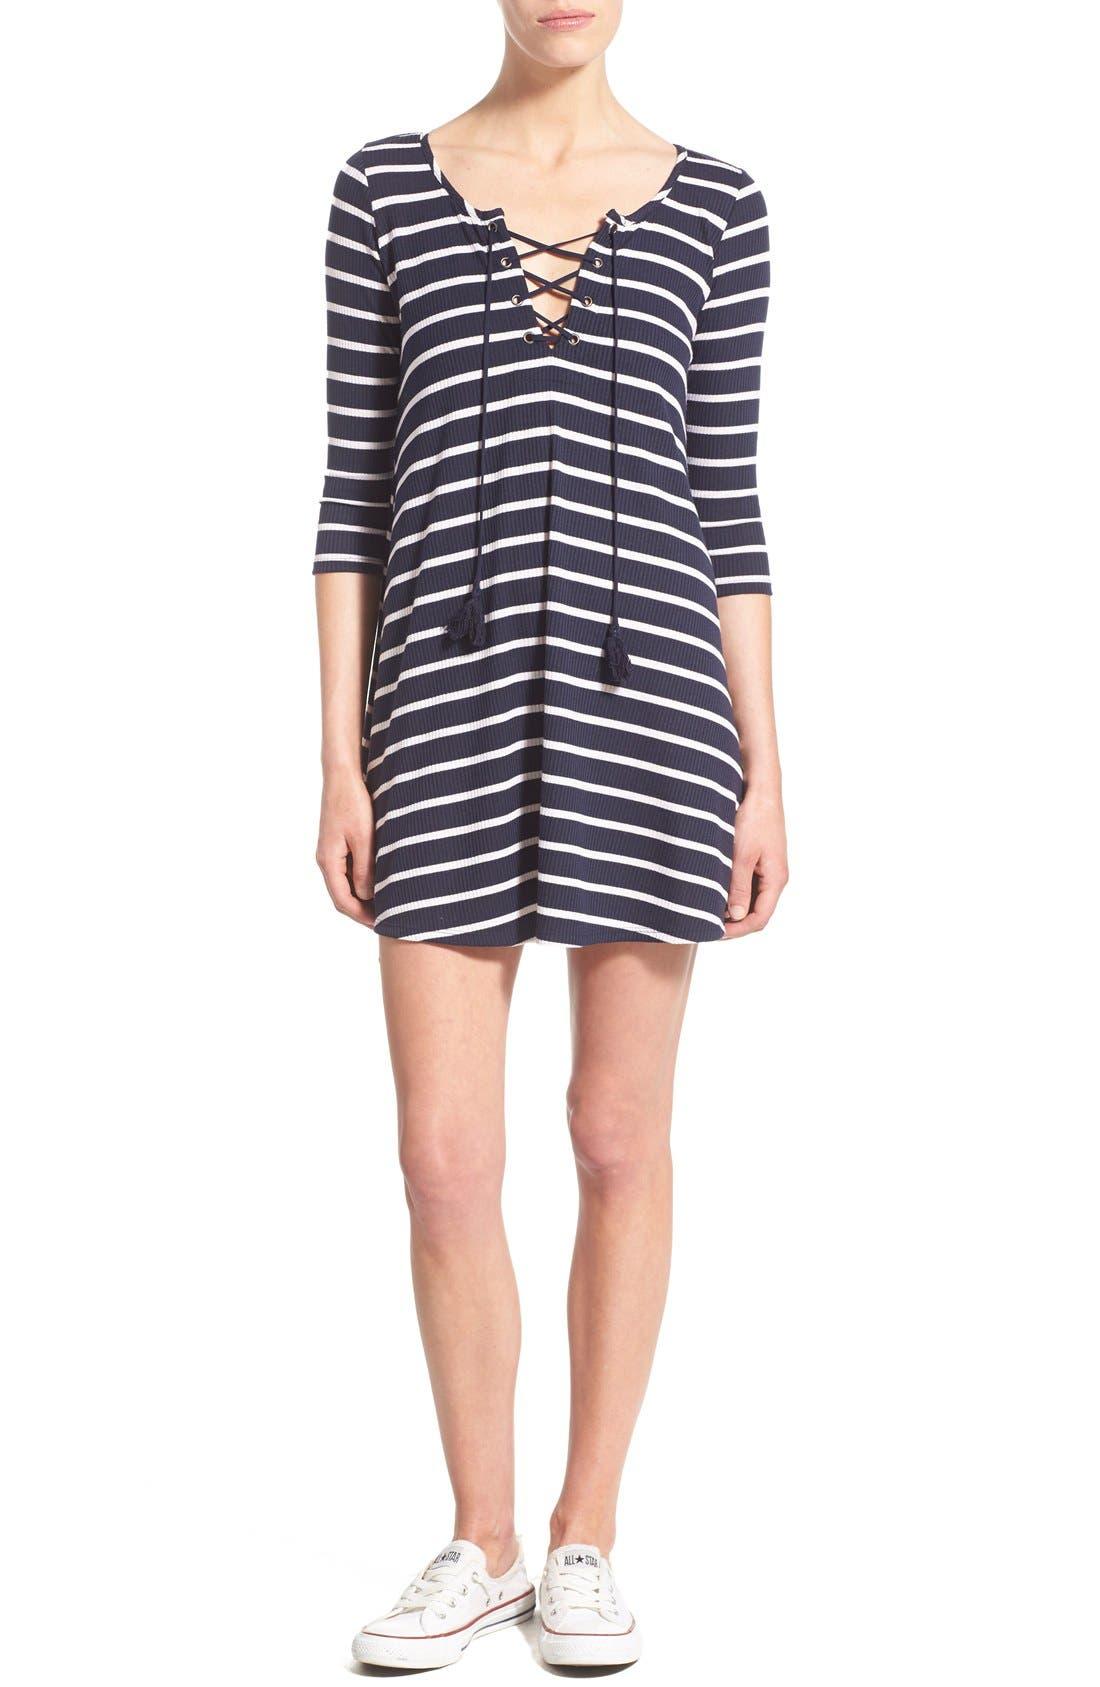 SOCIALITE, Stripe Lace-Up Minidress, Main thumbnail 1, color, 466